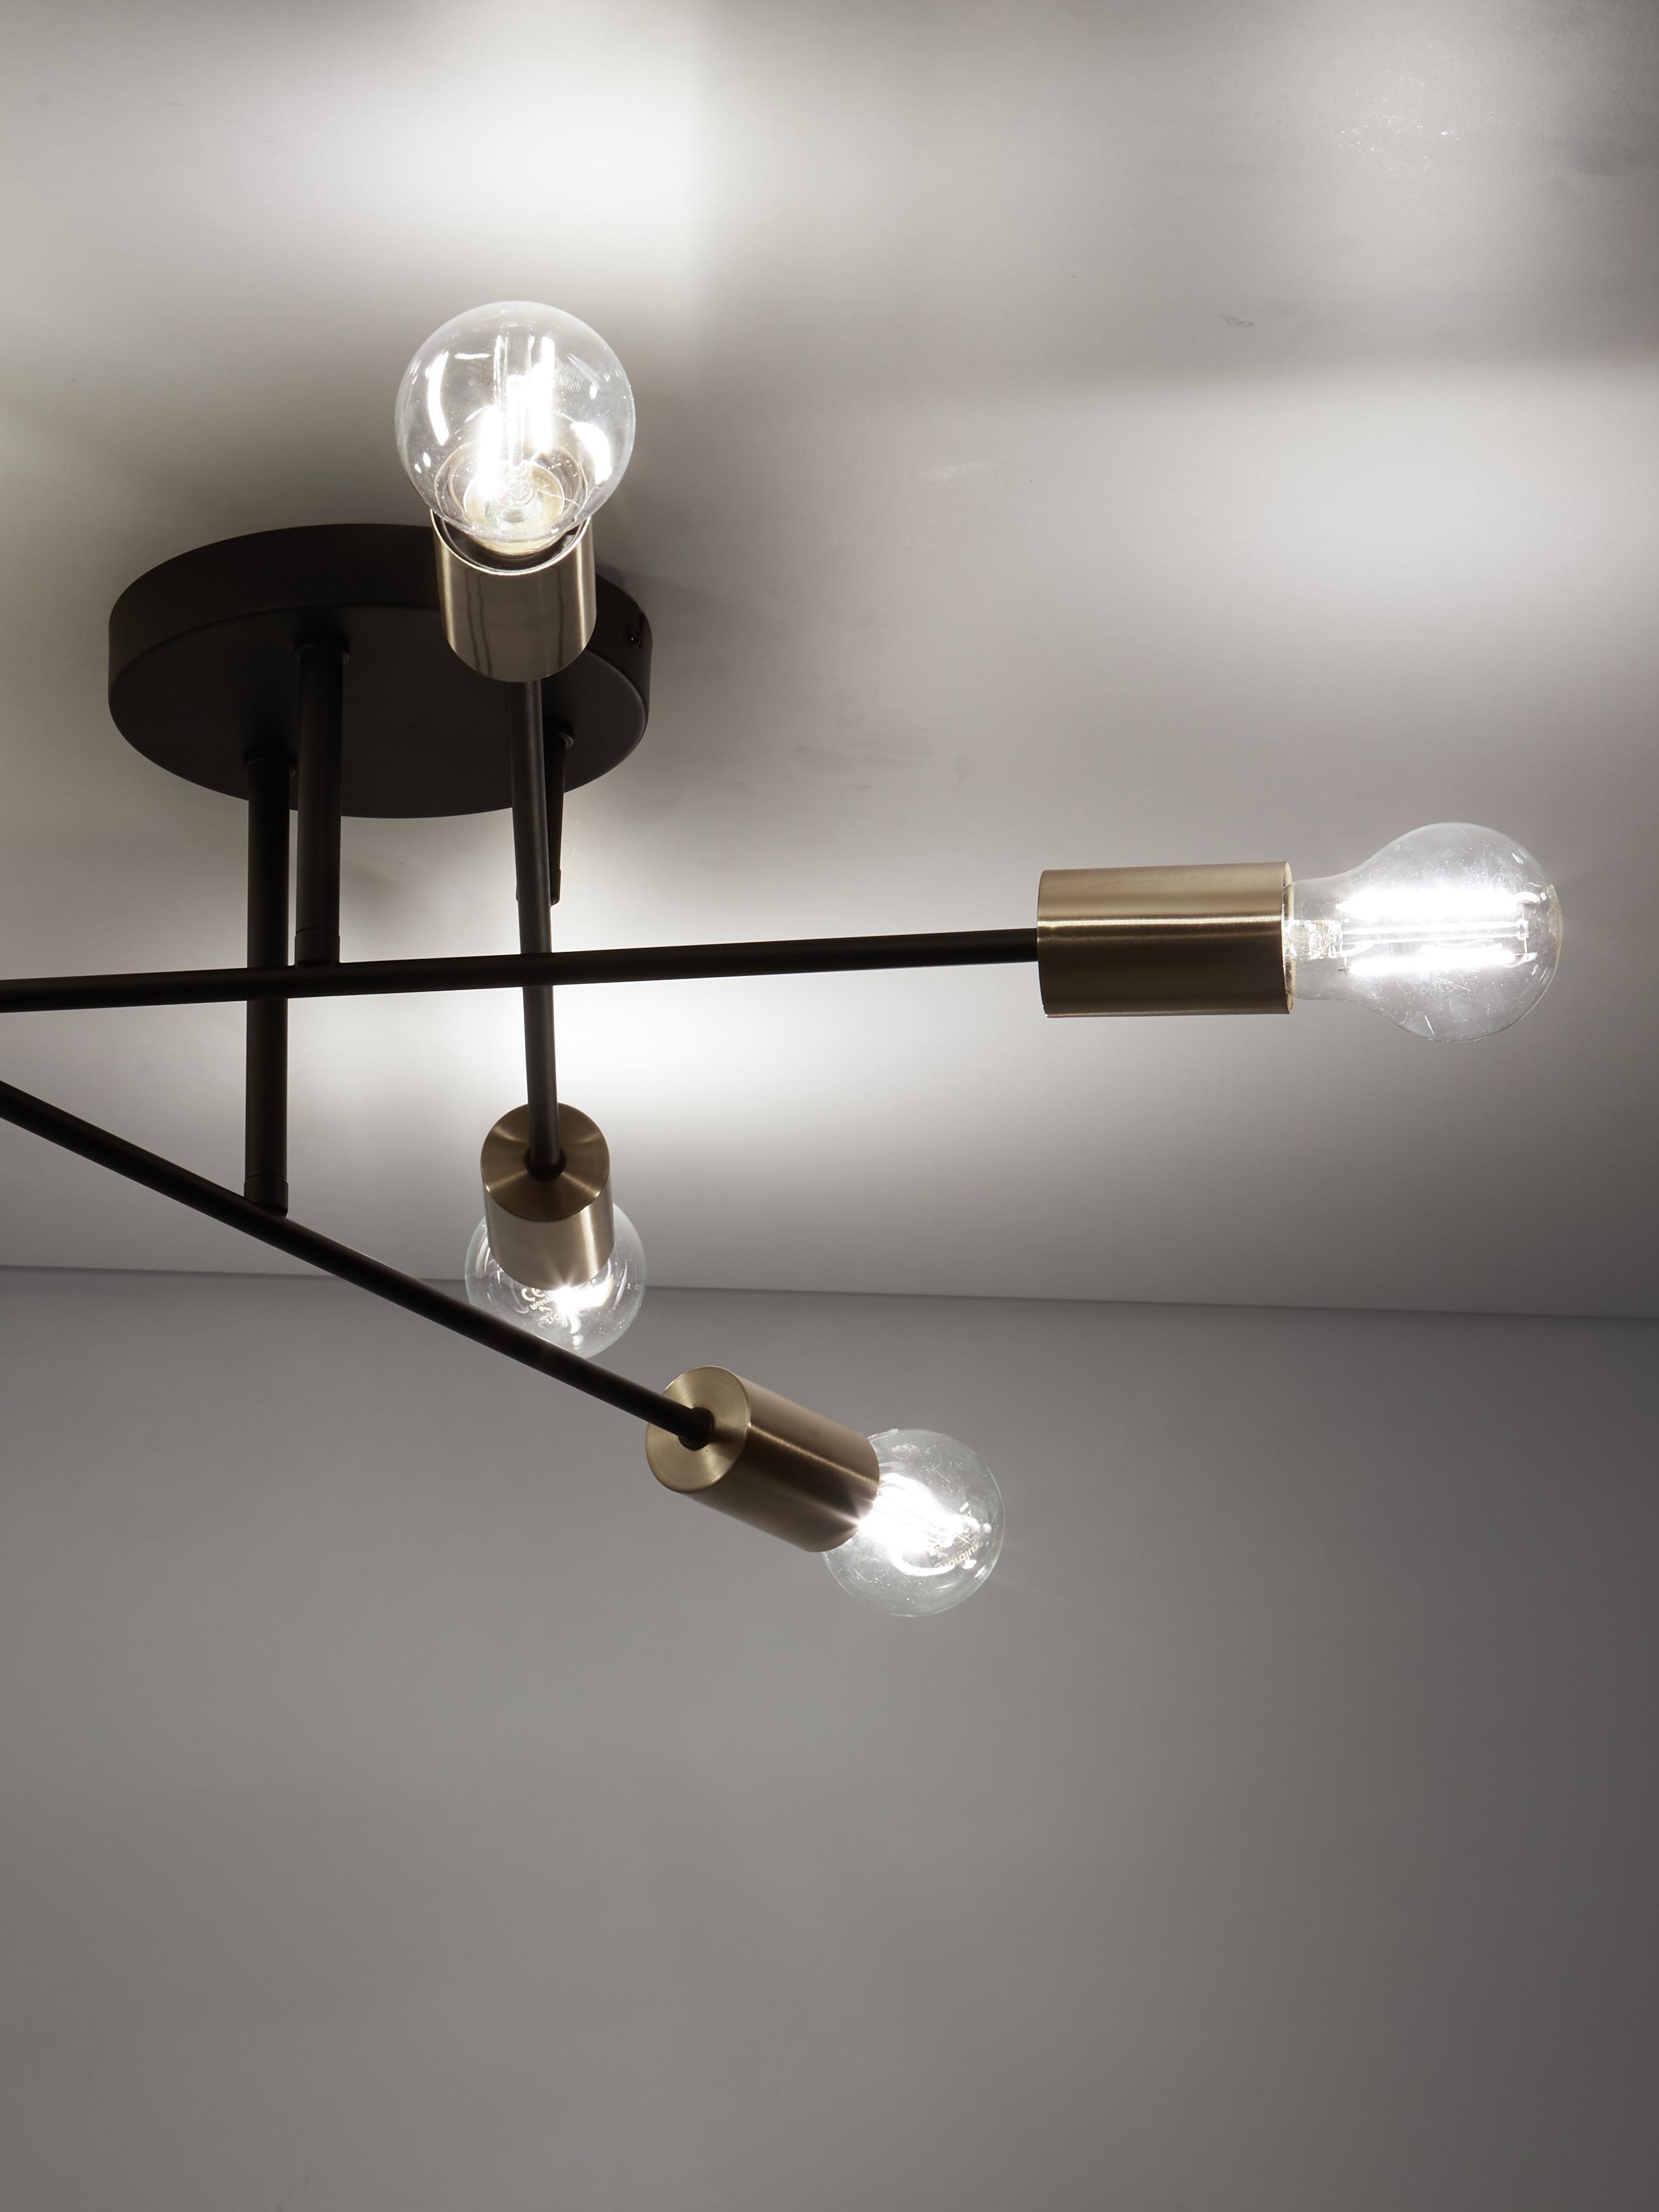 Lampada da soffitto Visby, Baldacchino: metallo verniciato a polv, Paralume: vetro, Nero, Ø 55 x Alt. 20 cm